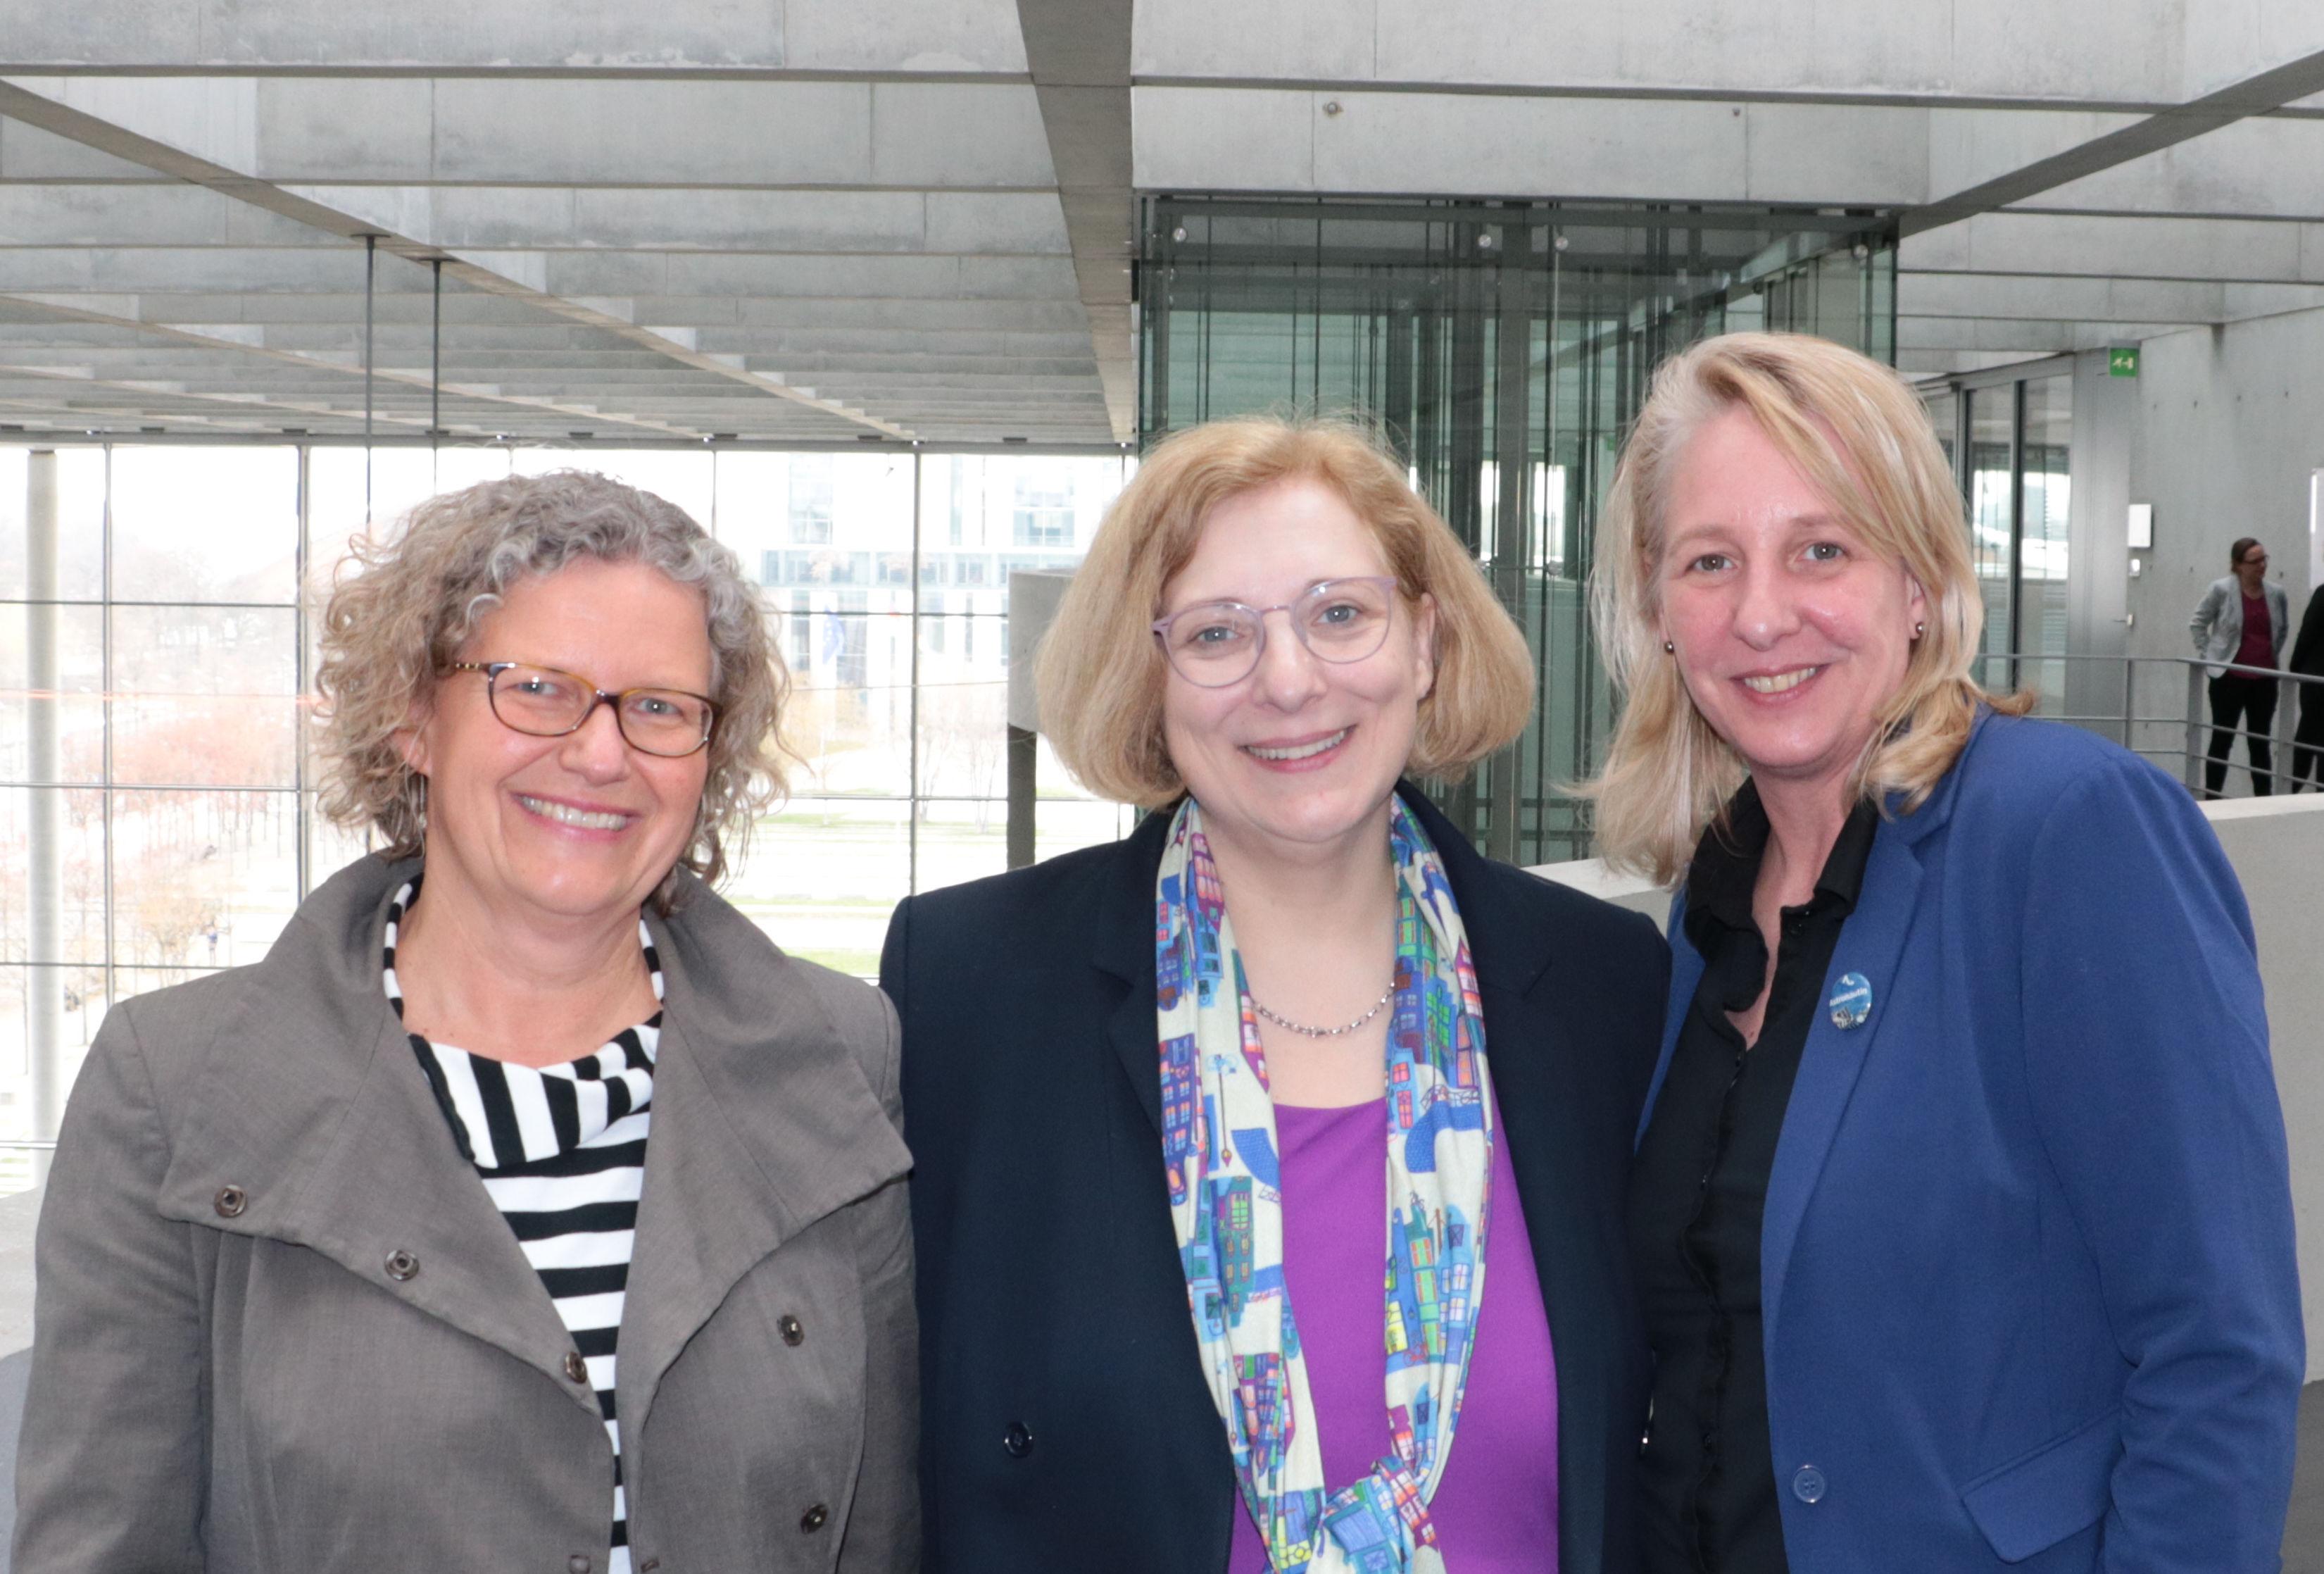 Claudia Kessler, Dr. Daniela De Ridder und Inka Helmke